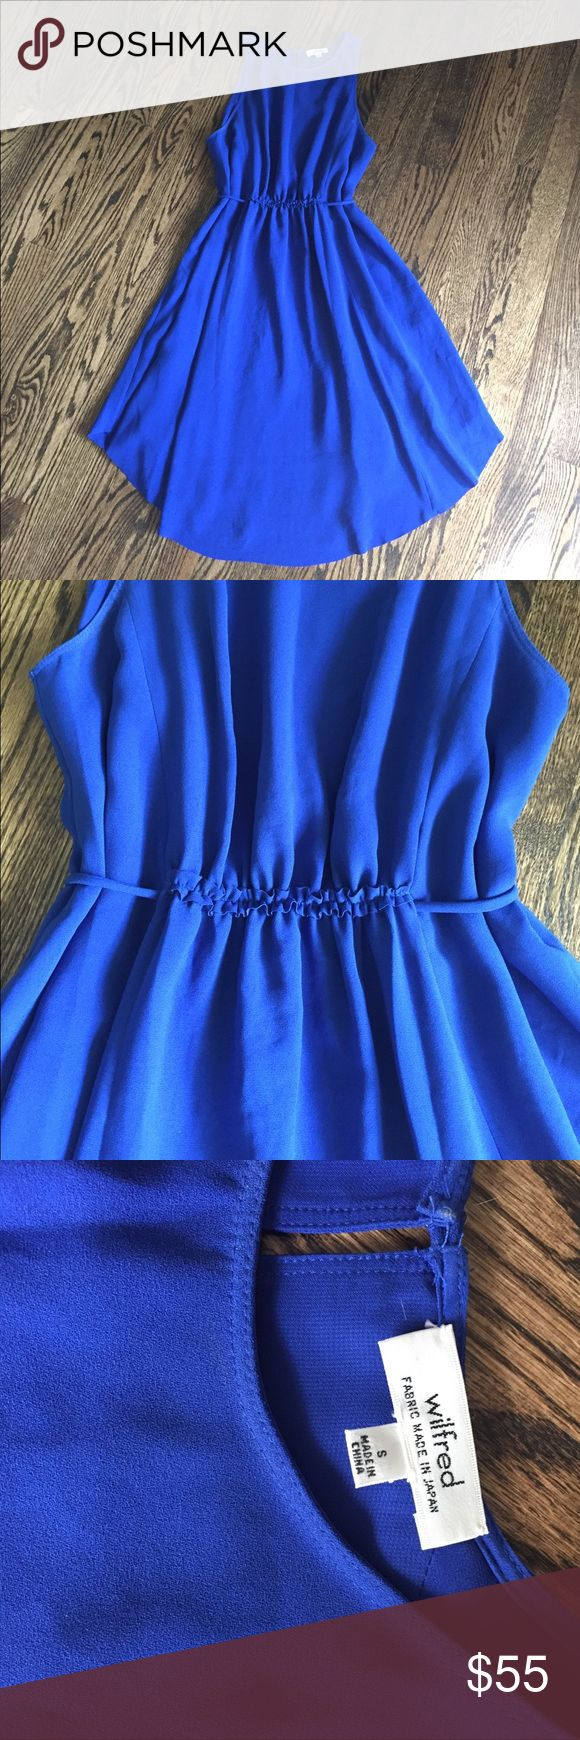 Wilfred royal blue dress by Aritzia. Sz Small